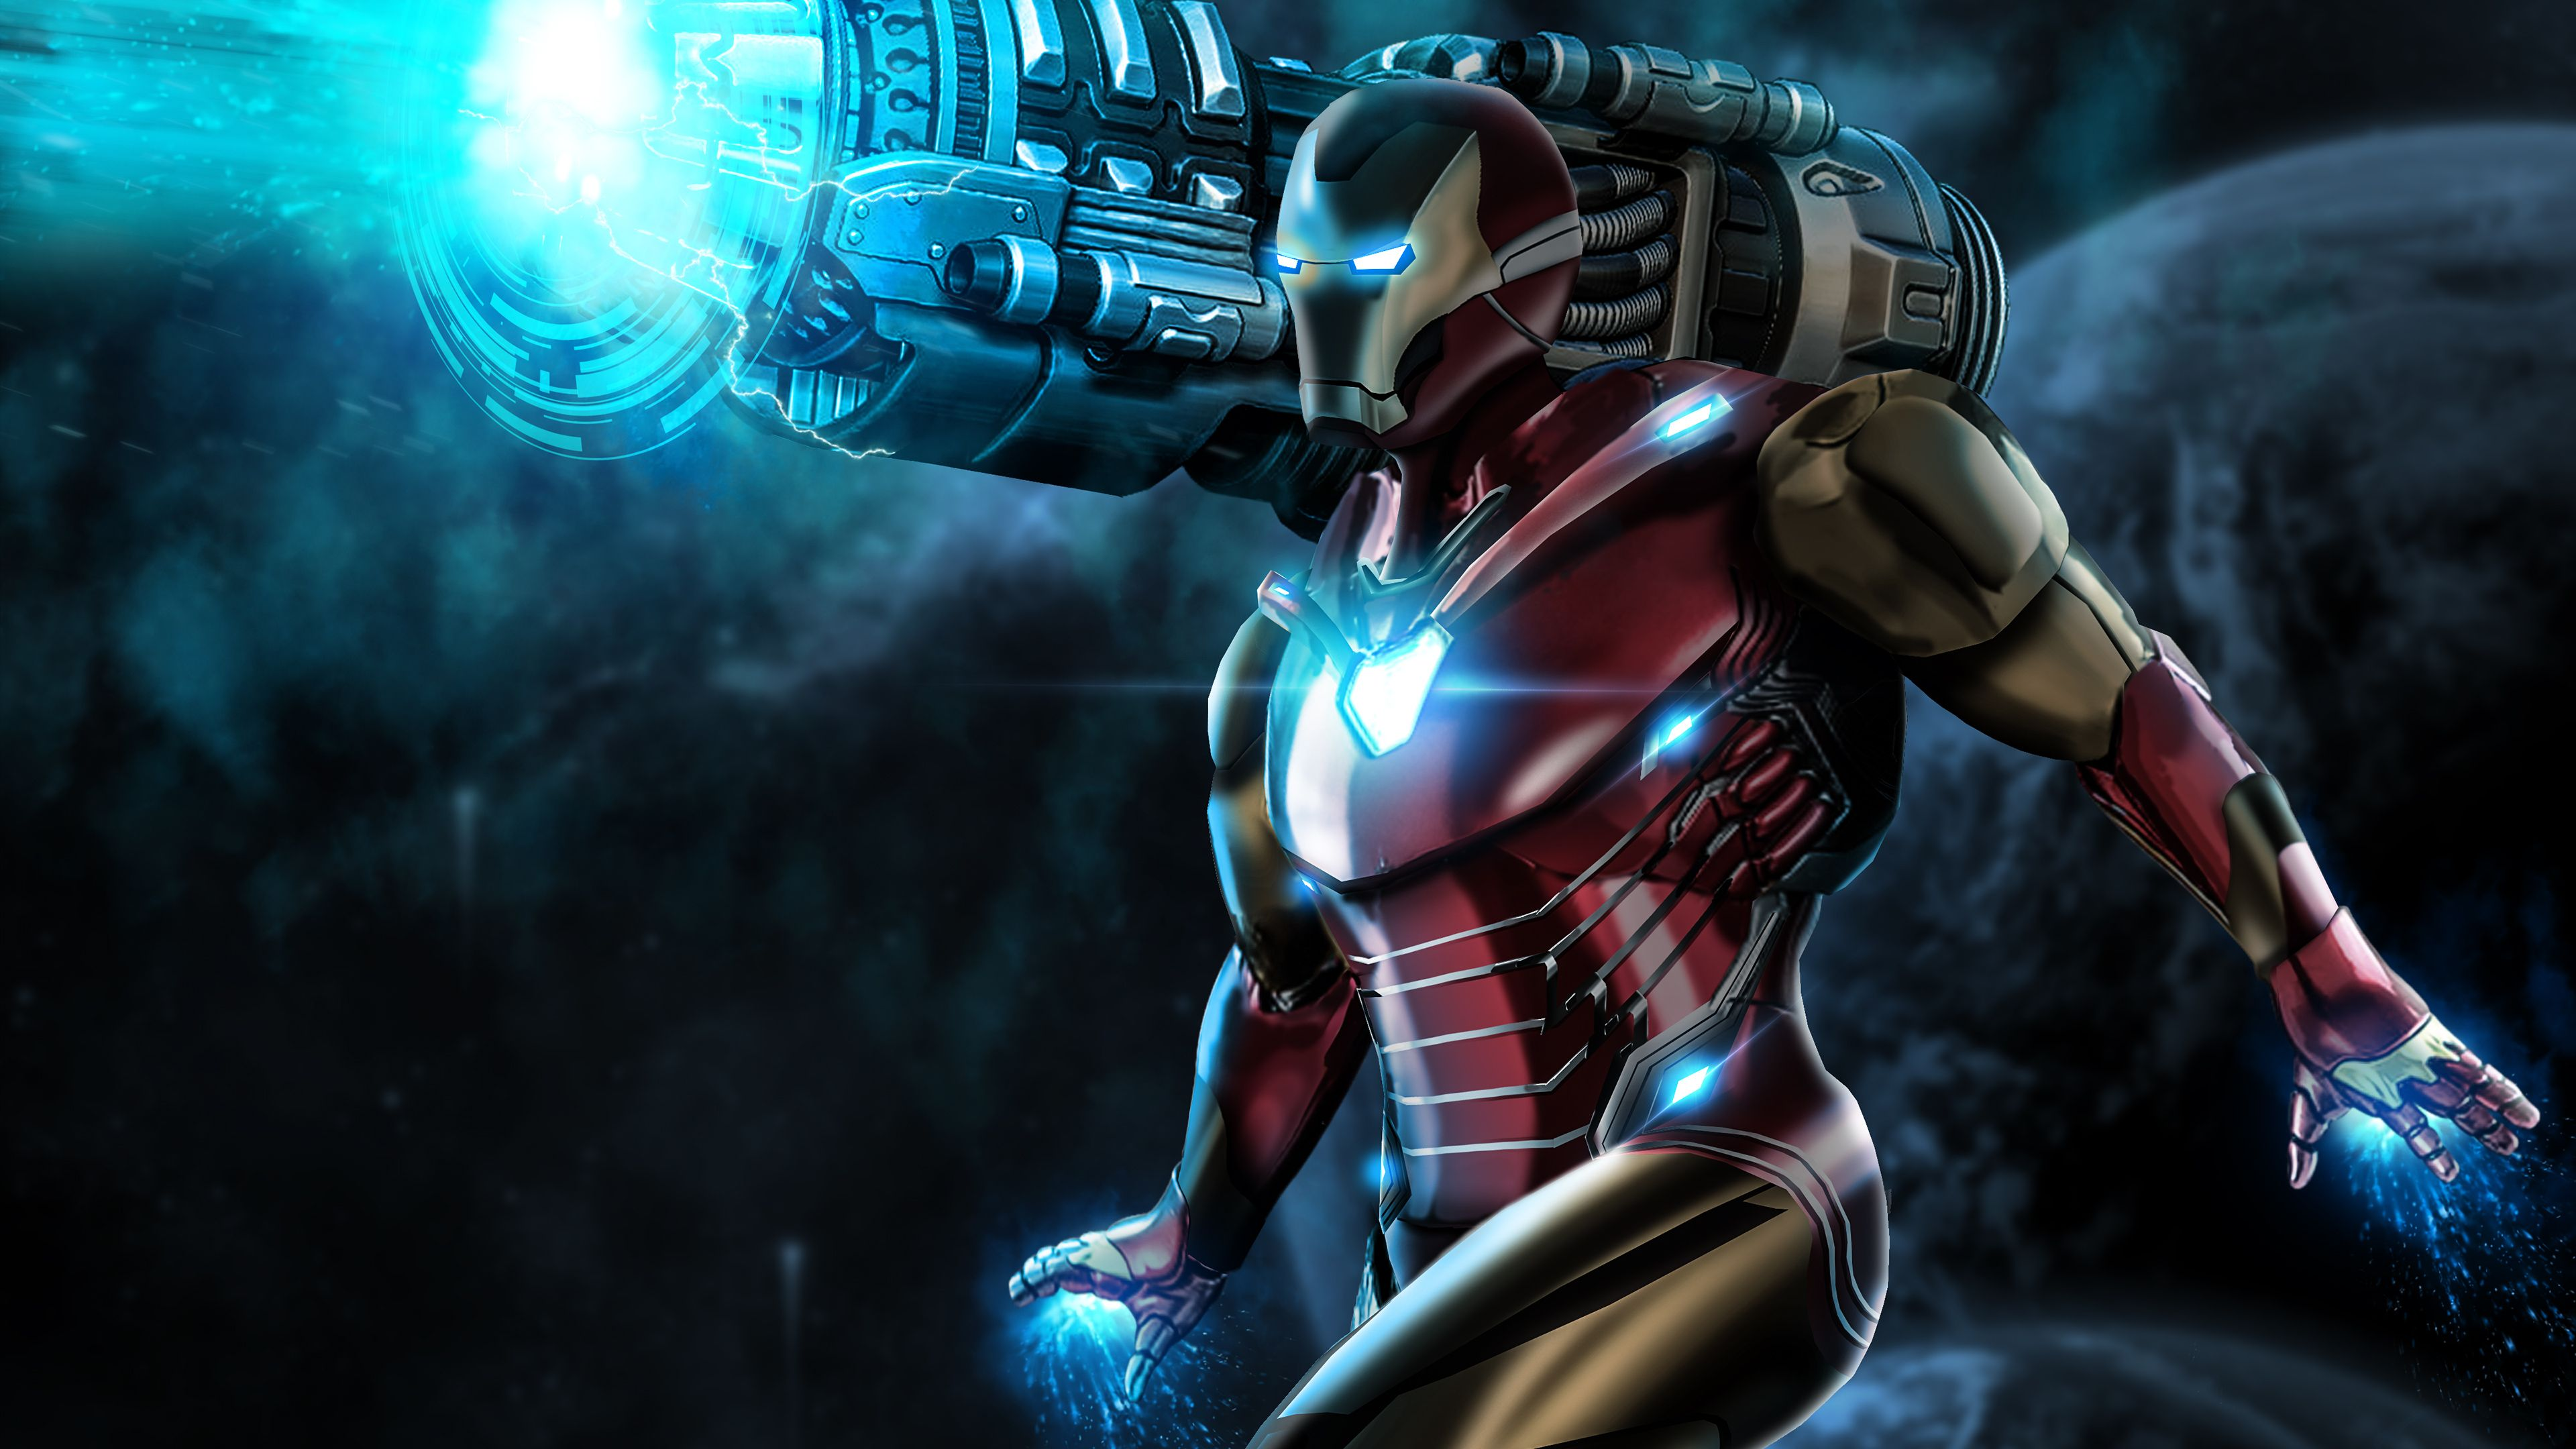 Iron Man Proton Cannon 4k Superheroes Wallpapers Iron Man